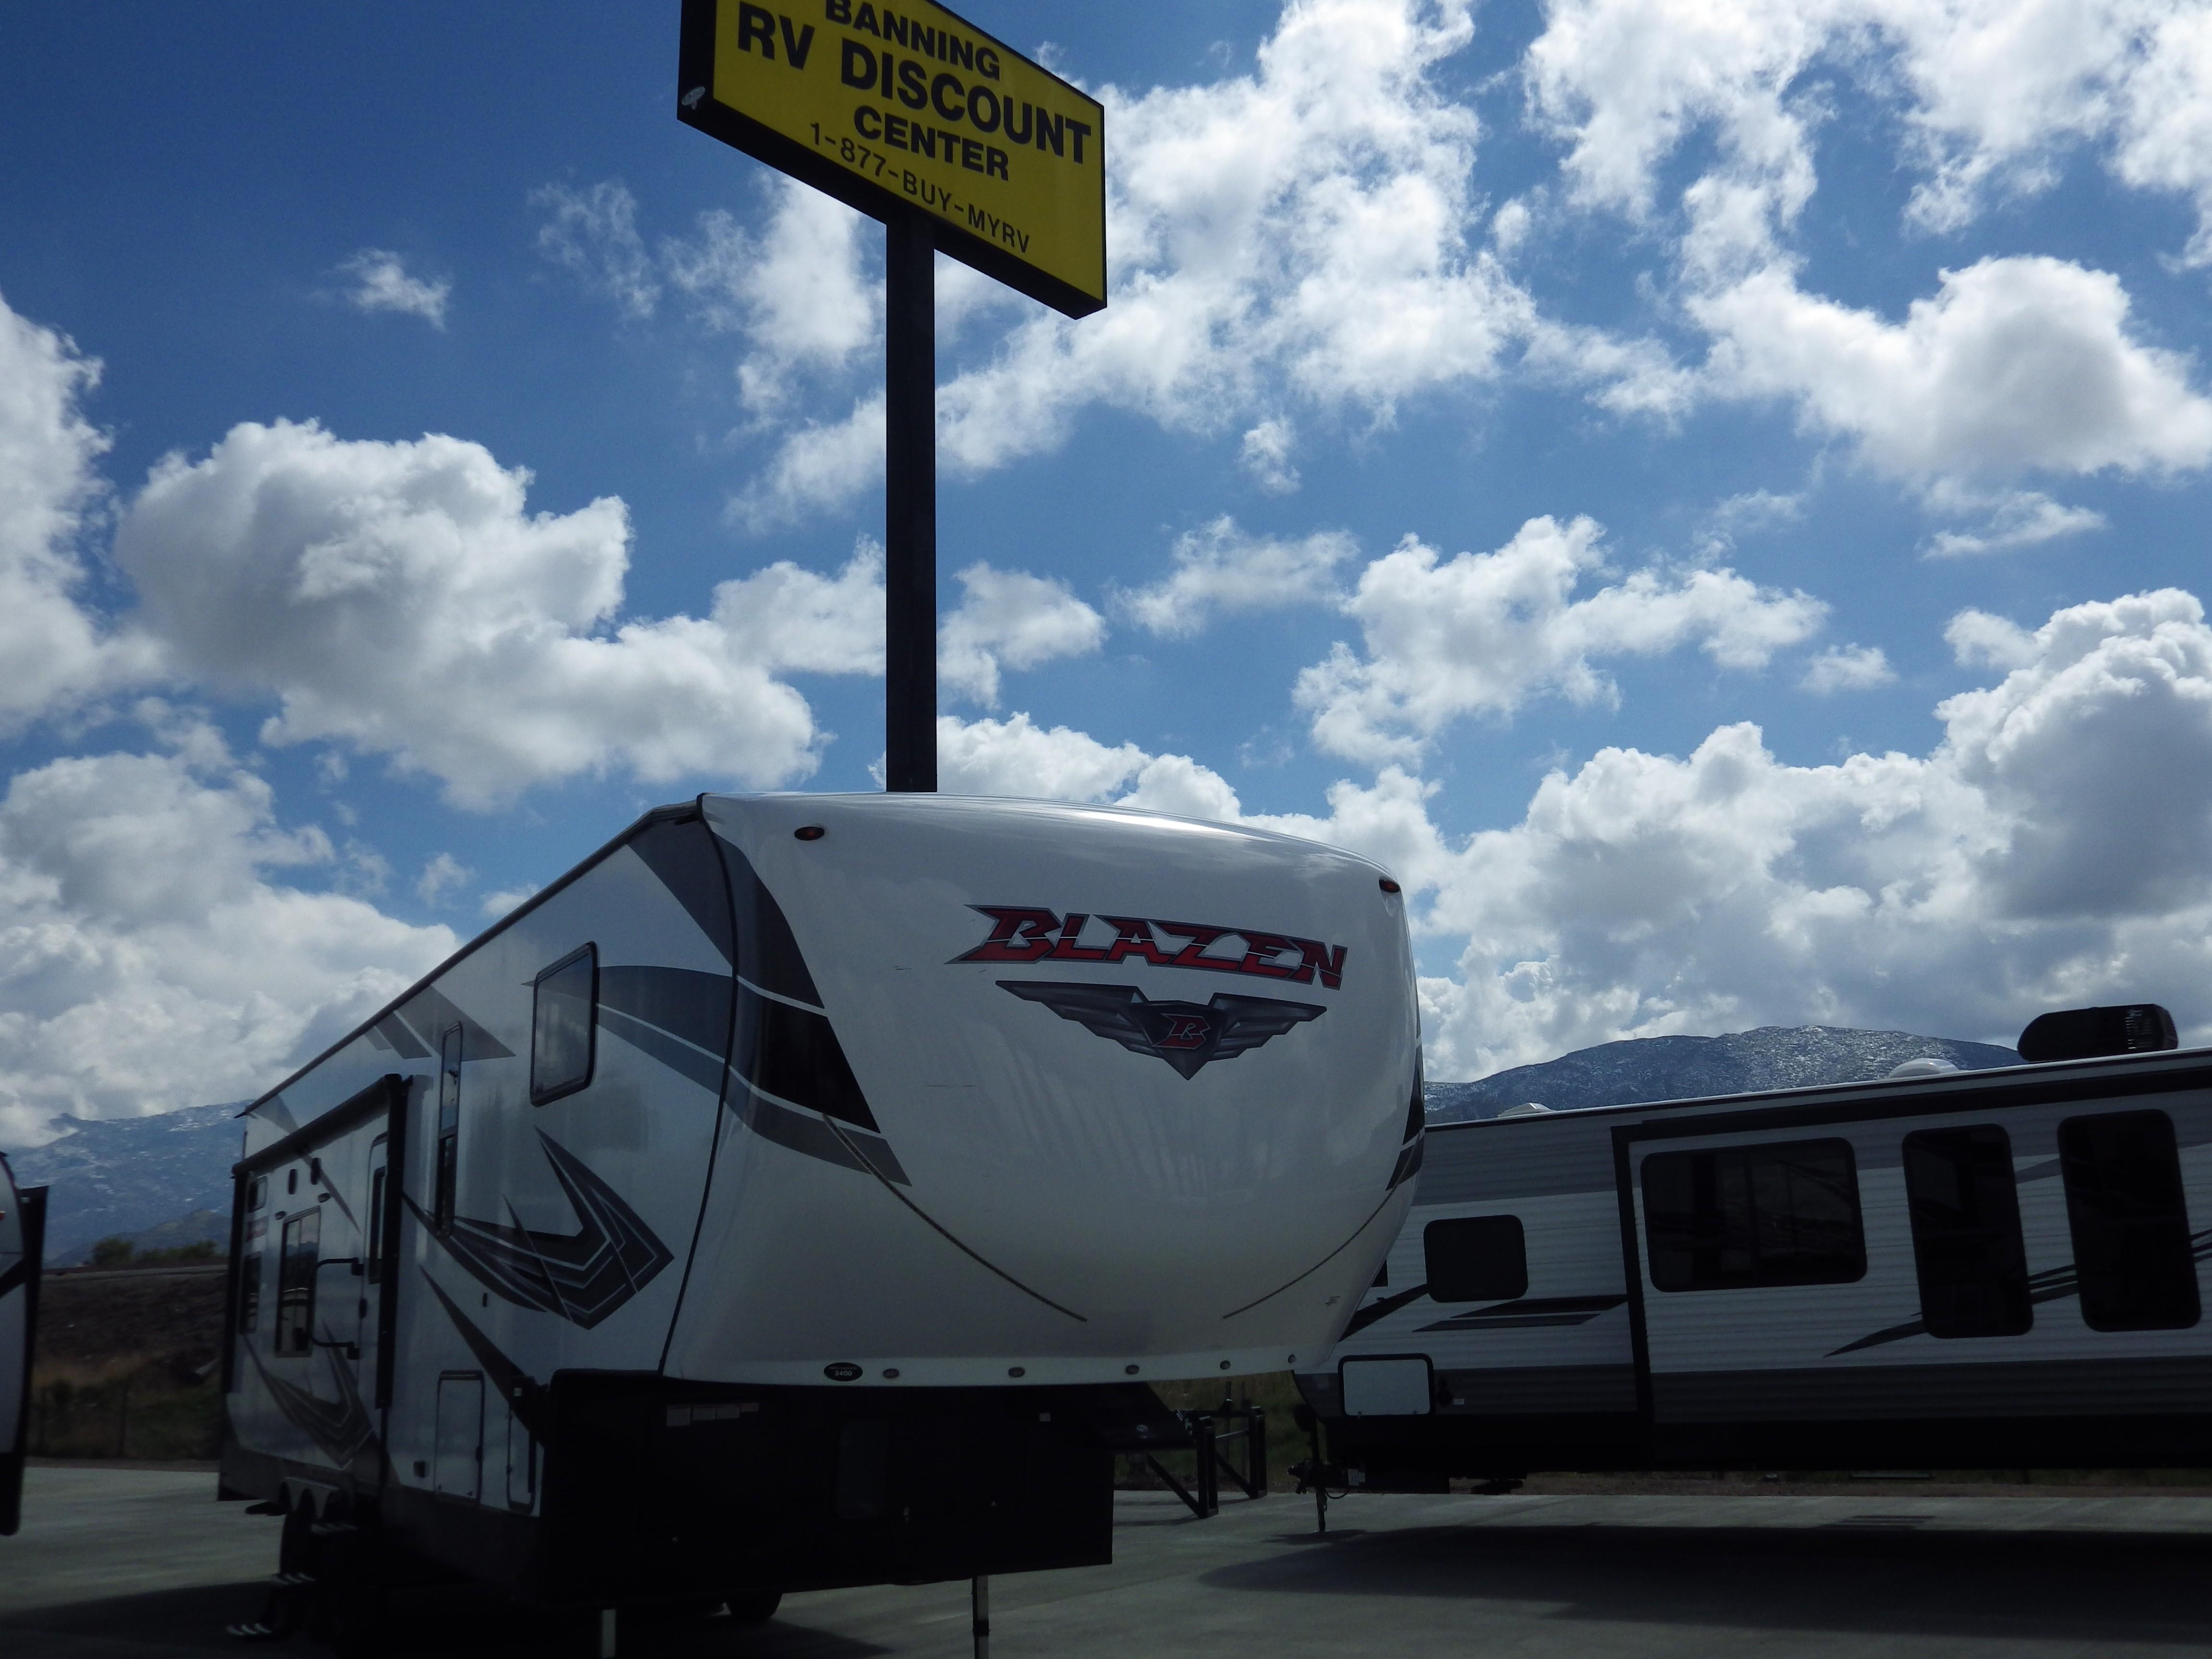 Used, 2021, Pacific Coachworks, BLAZEN 3400, Fifth Wheels